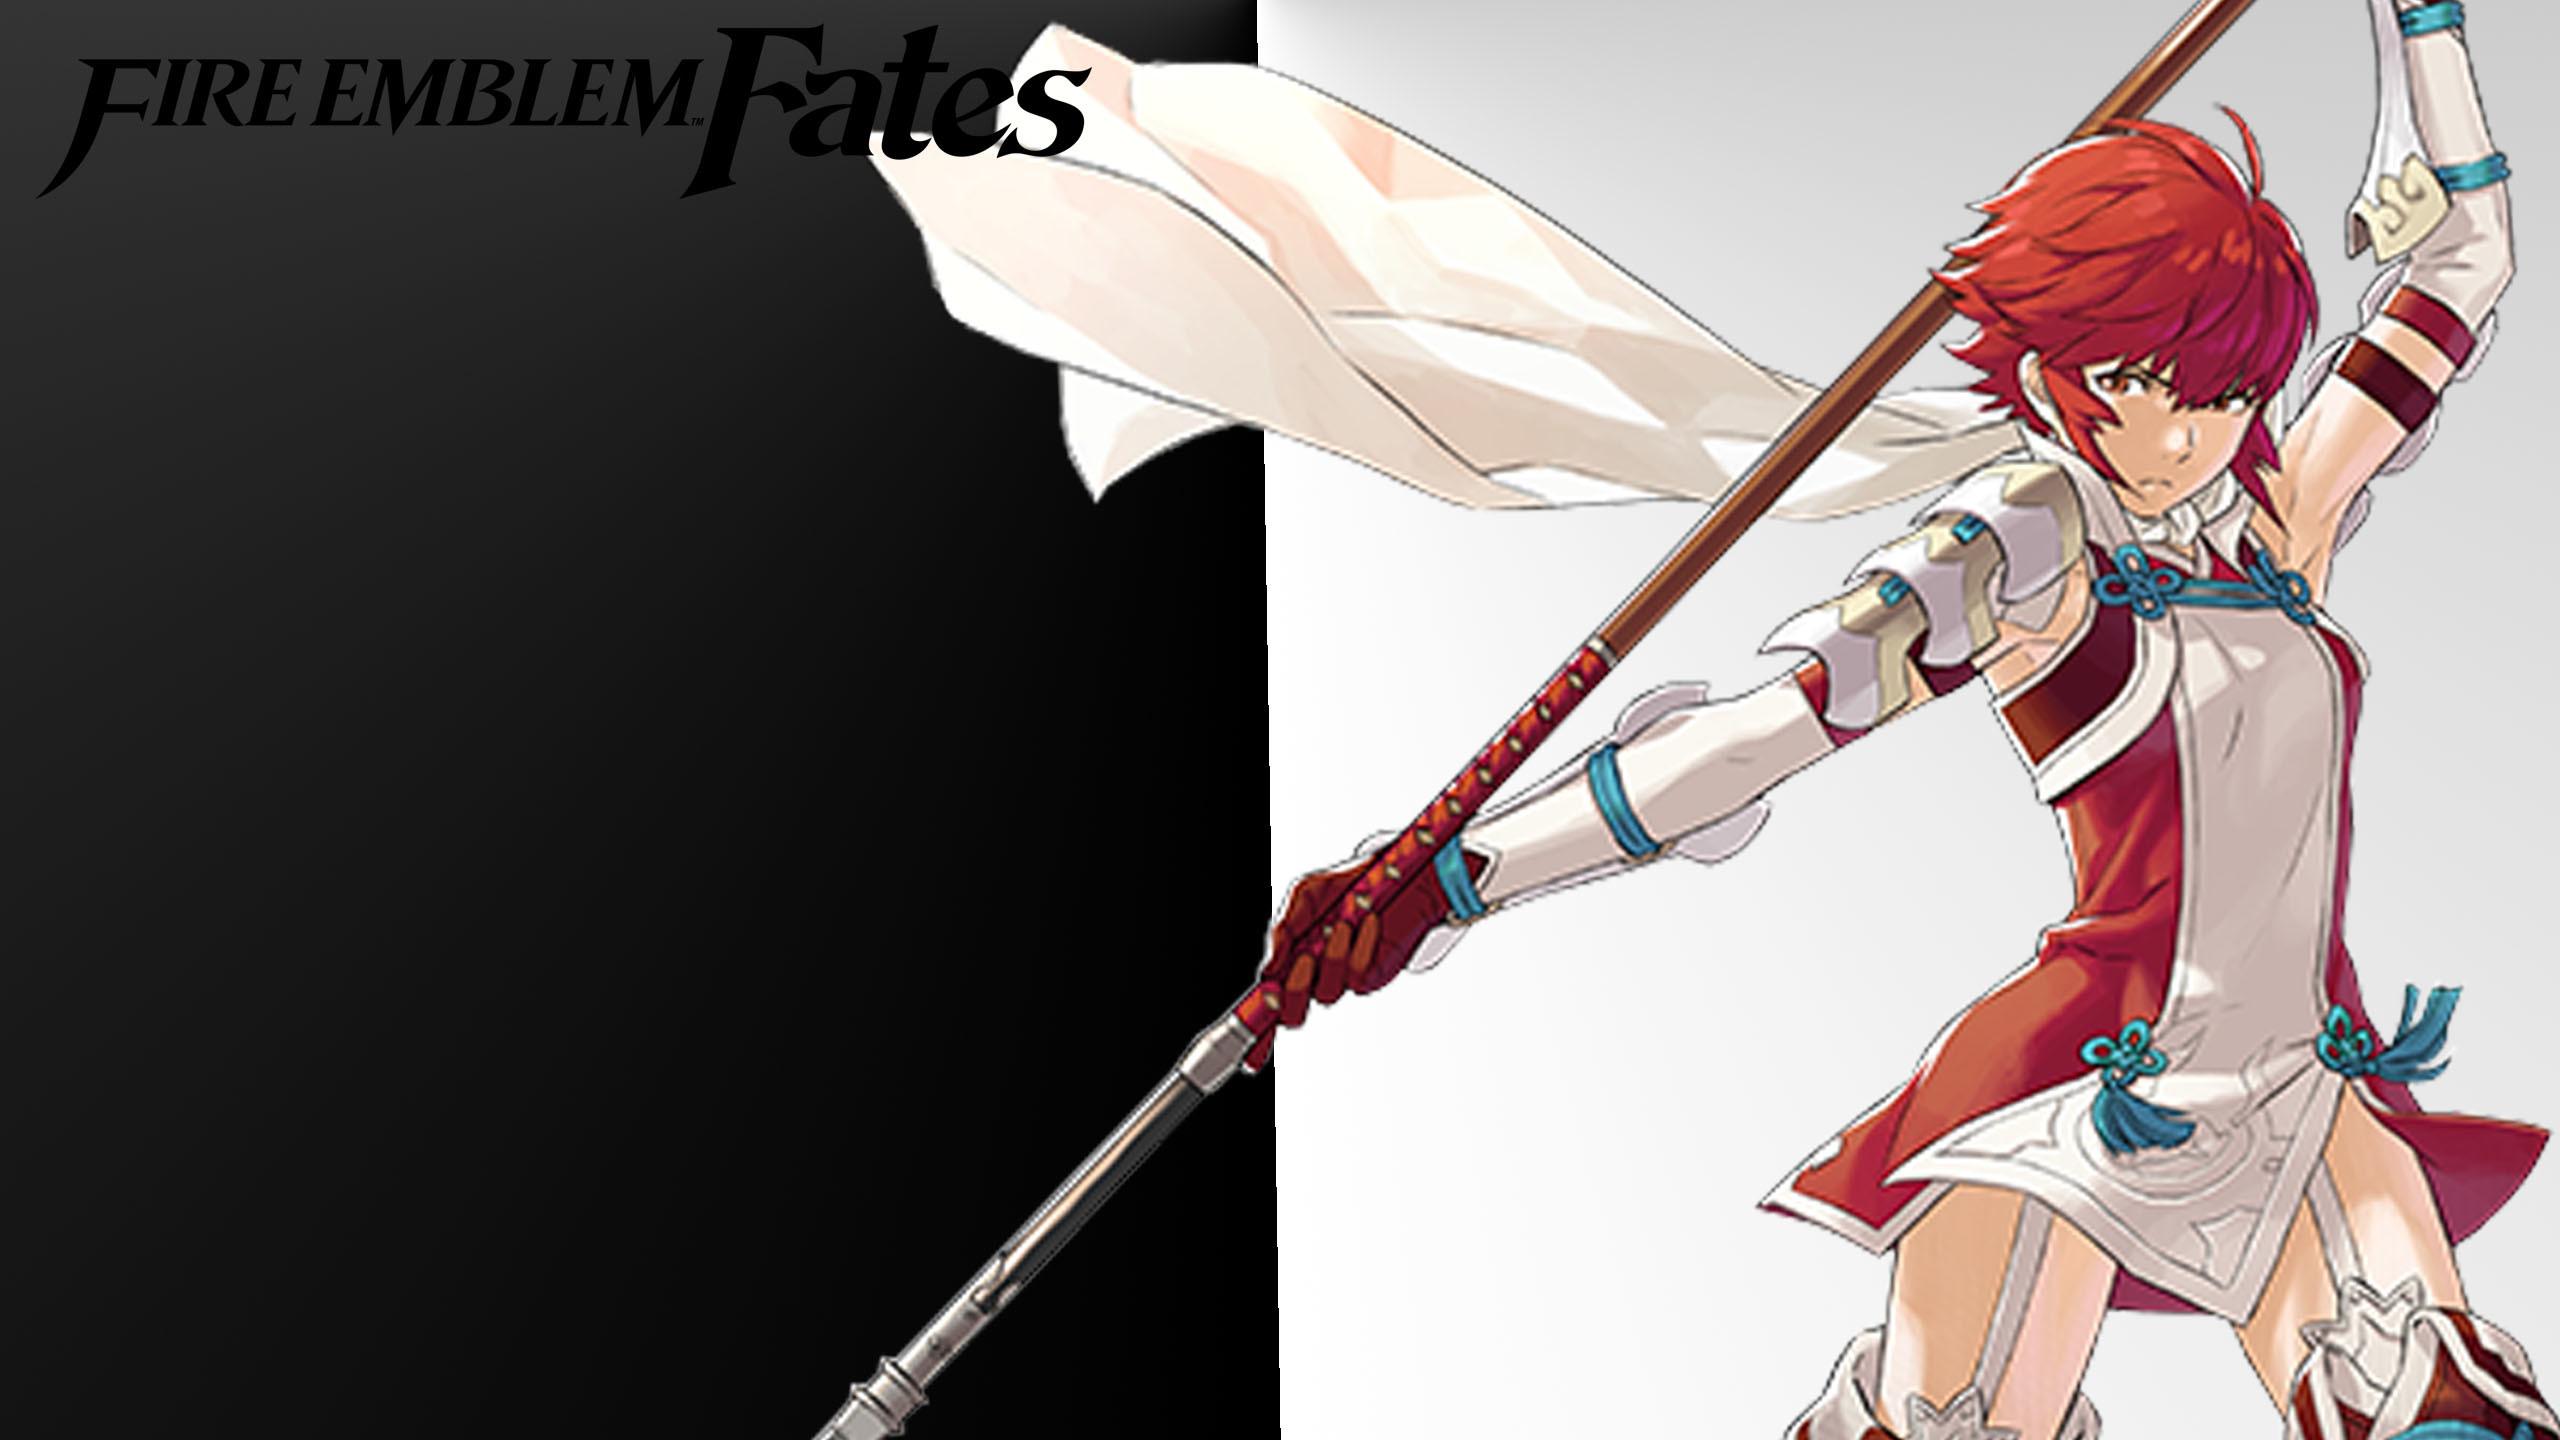 wallpaper.wiki-Images-fire-emblem-fates-lego-star-